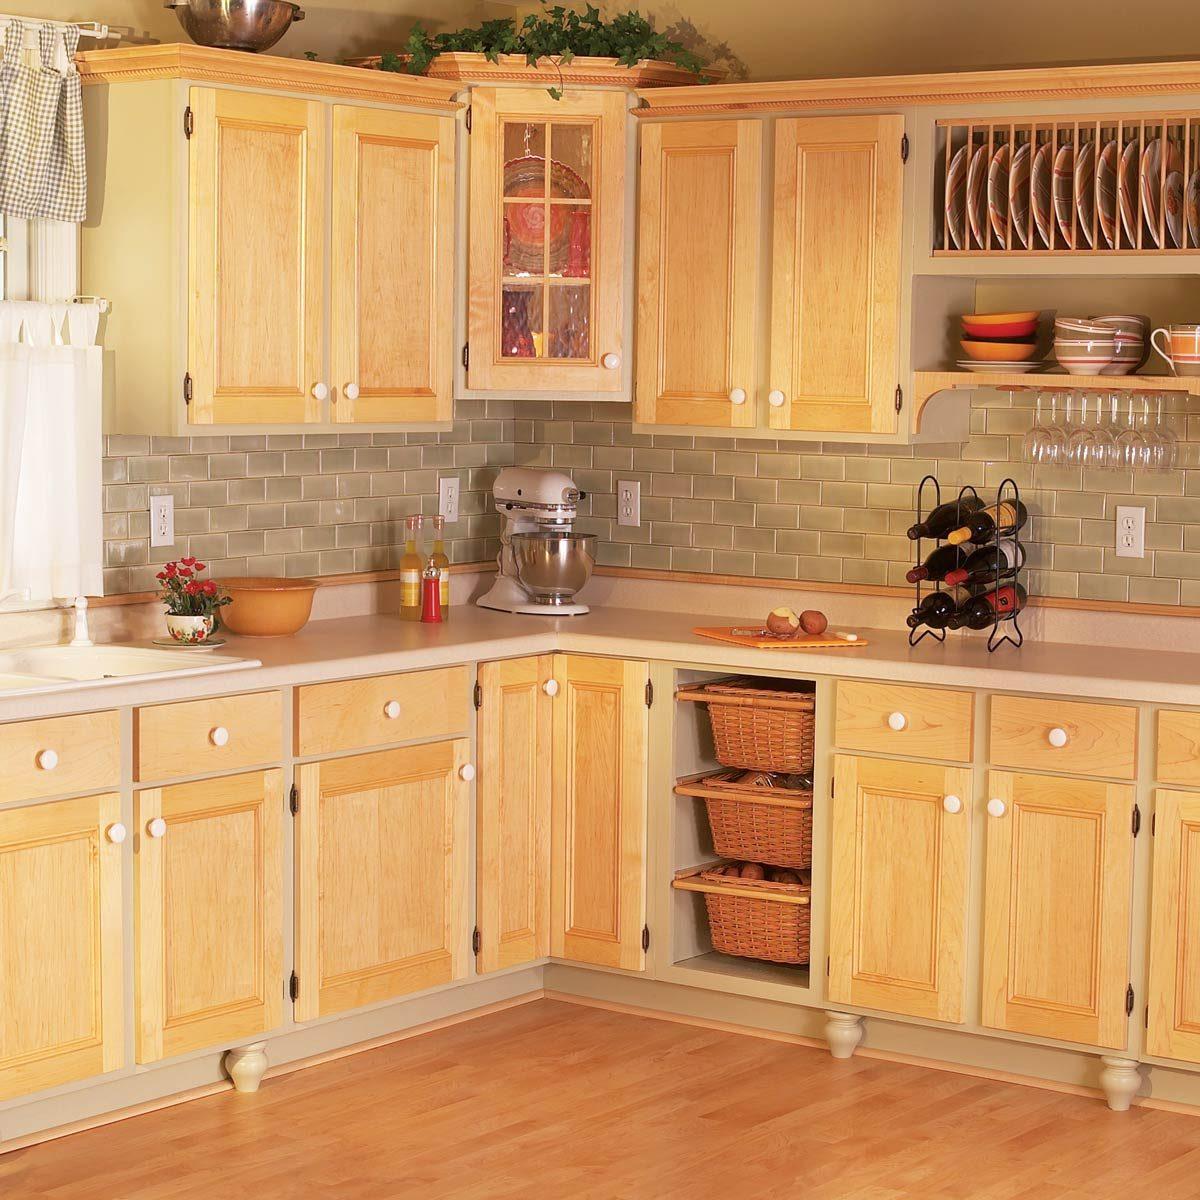 Rejuvenate Your Cabinets